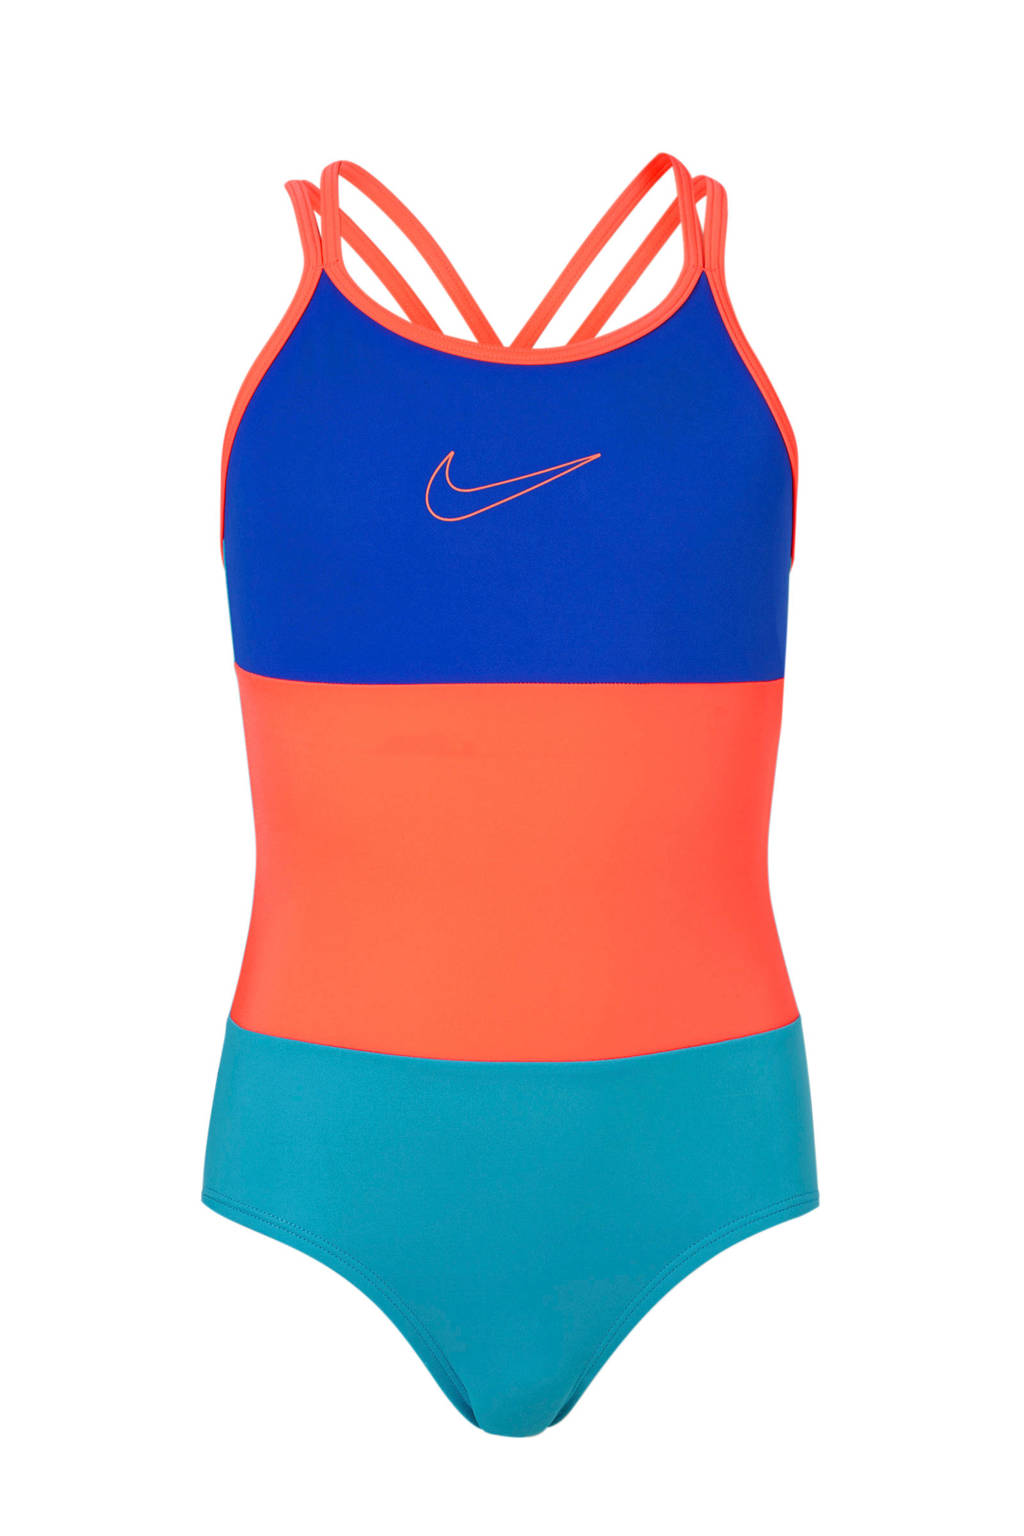 Nike sportbadpak met gekruiste bandjes neon roze, Neon roze/ blauw/turquoise